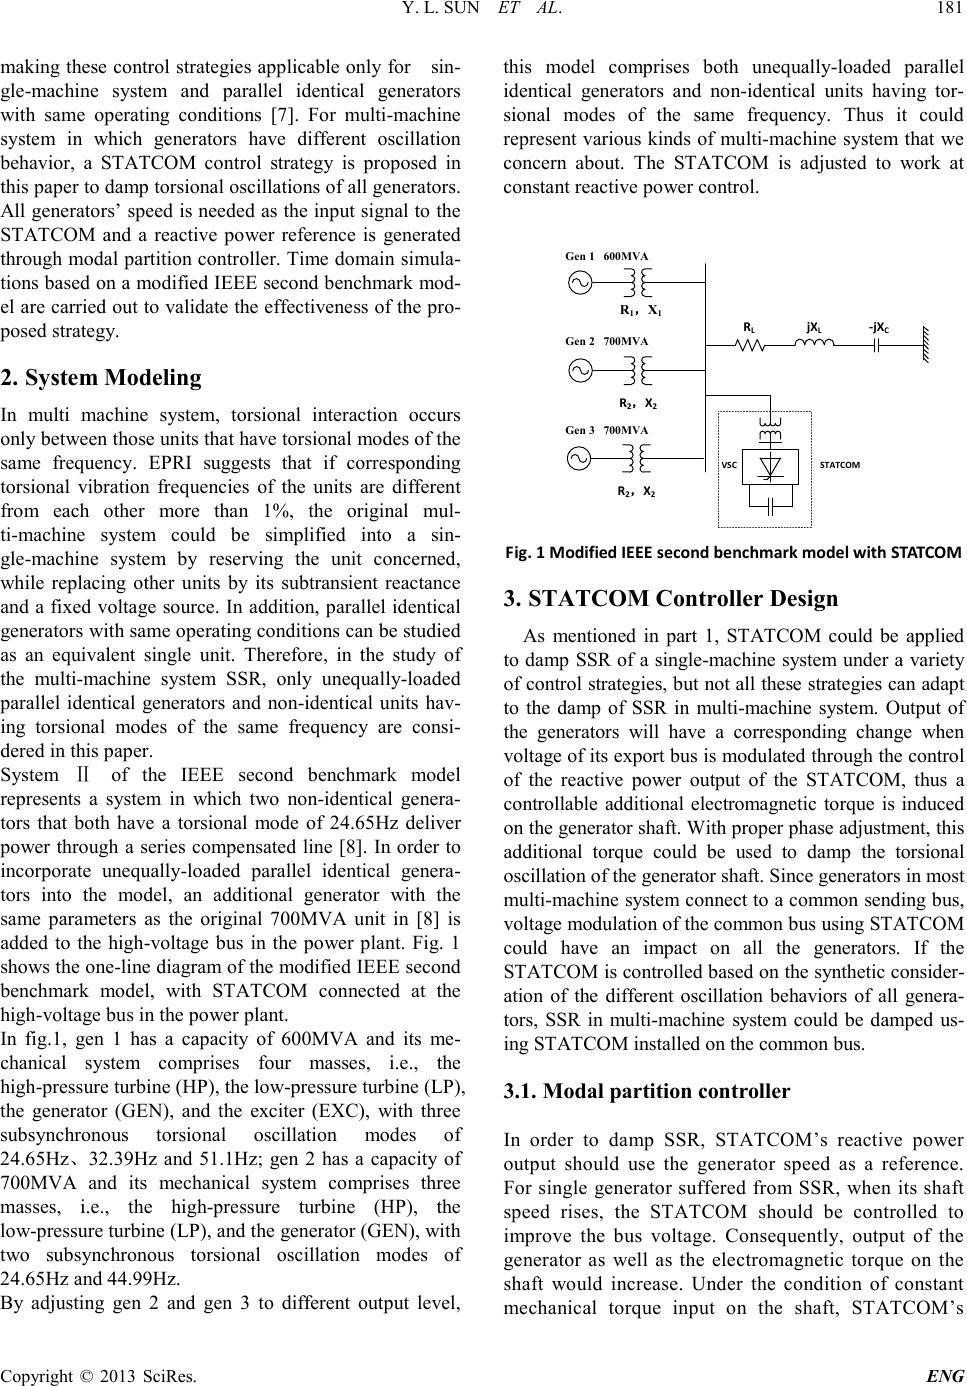 statcom thesis